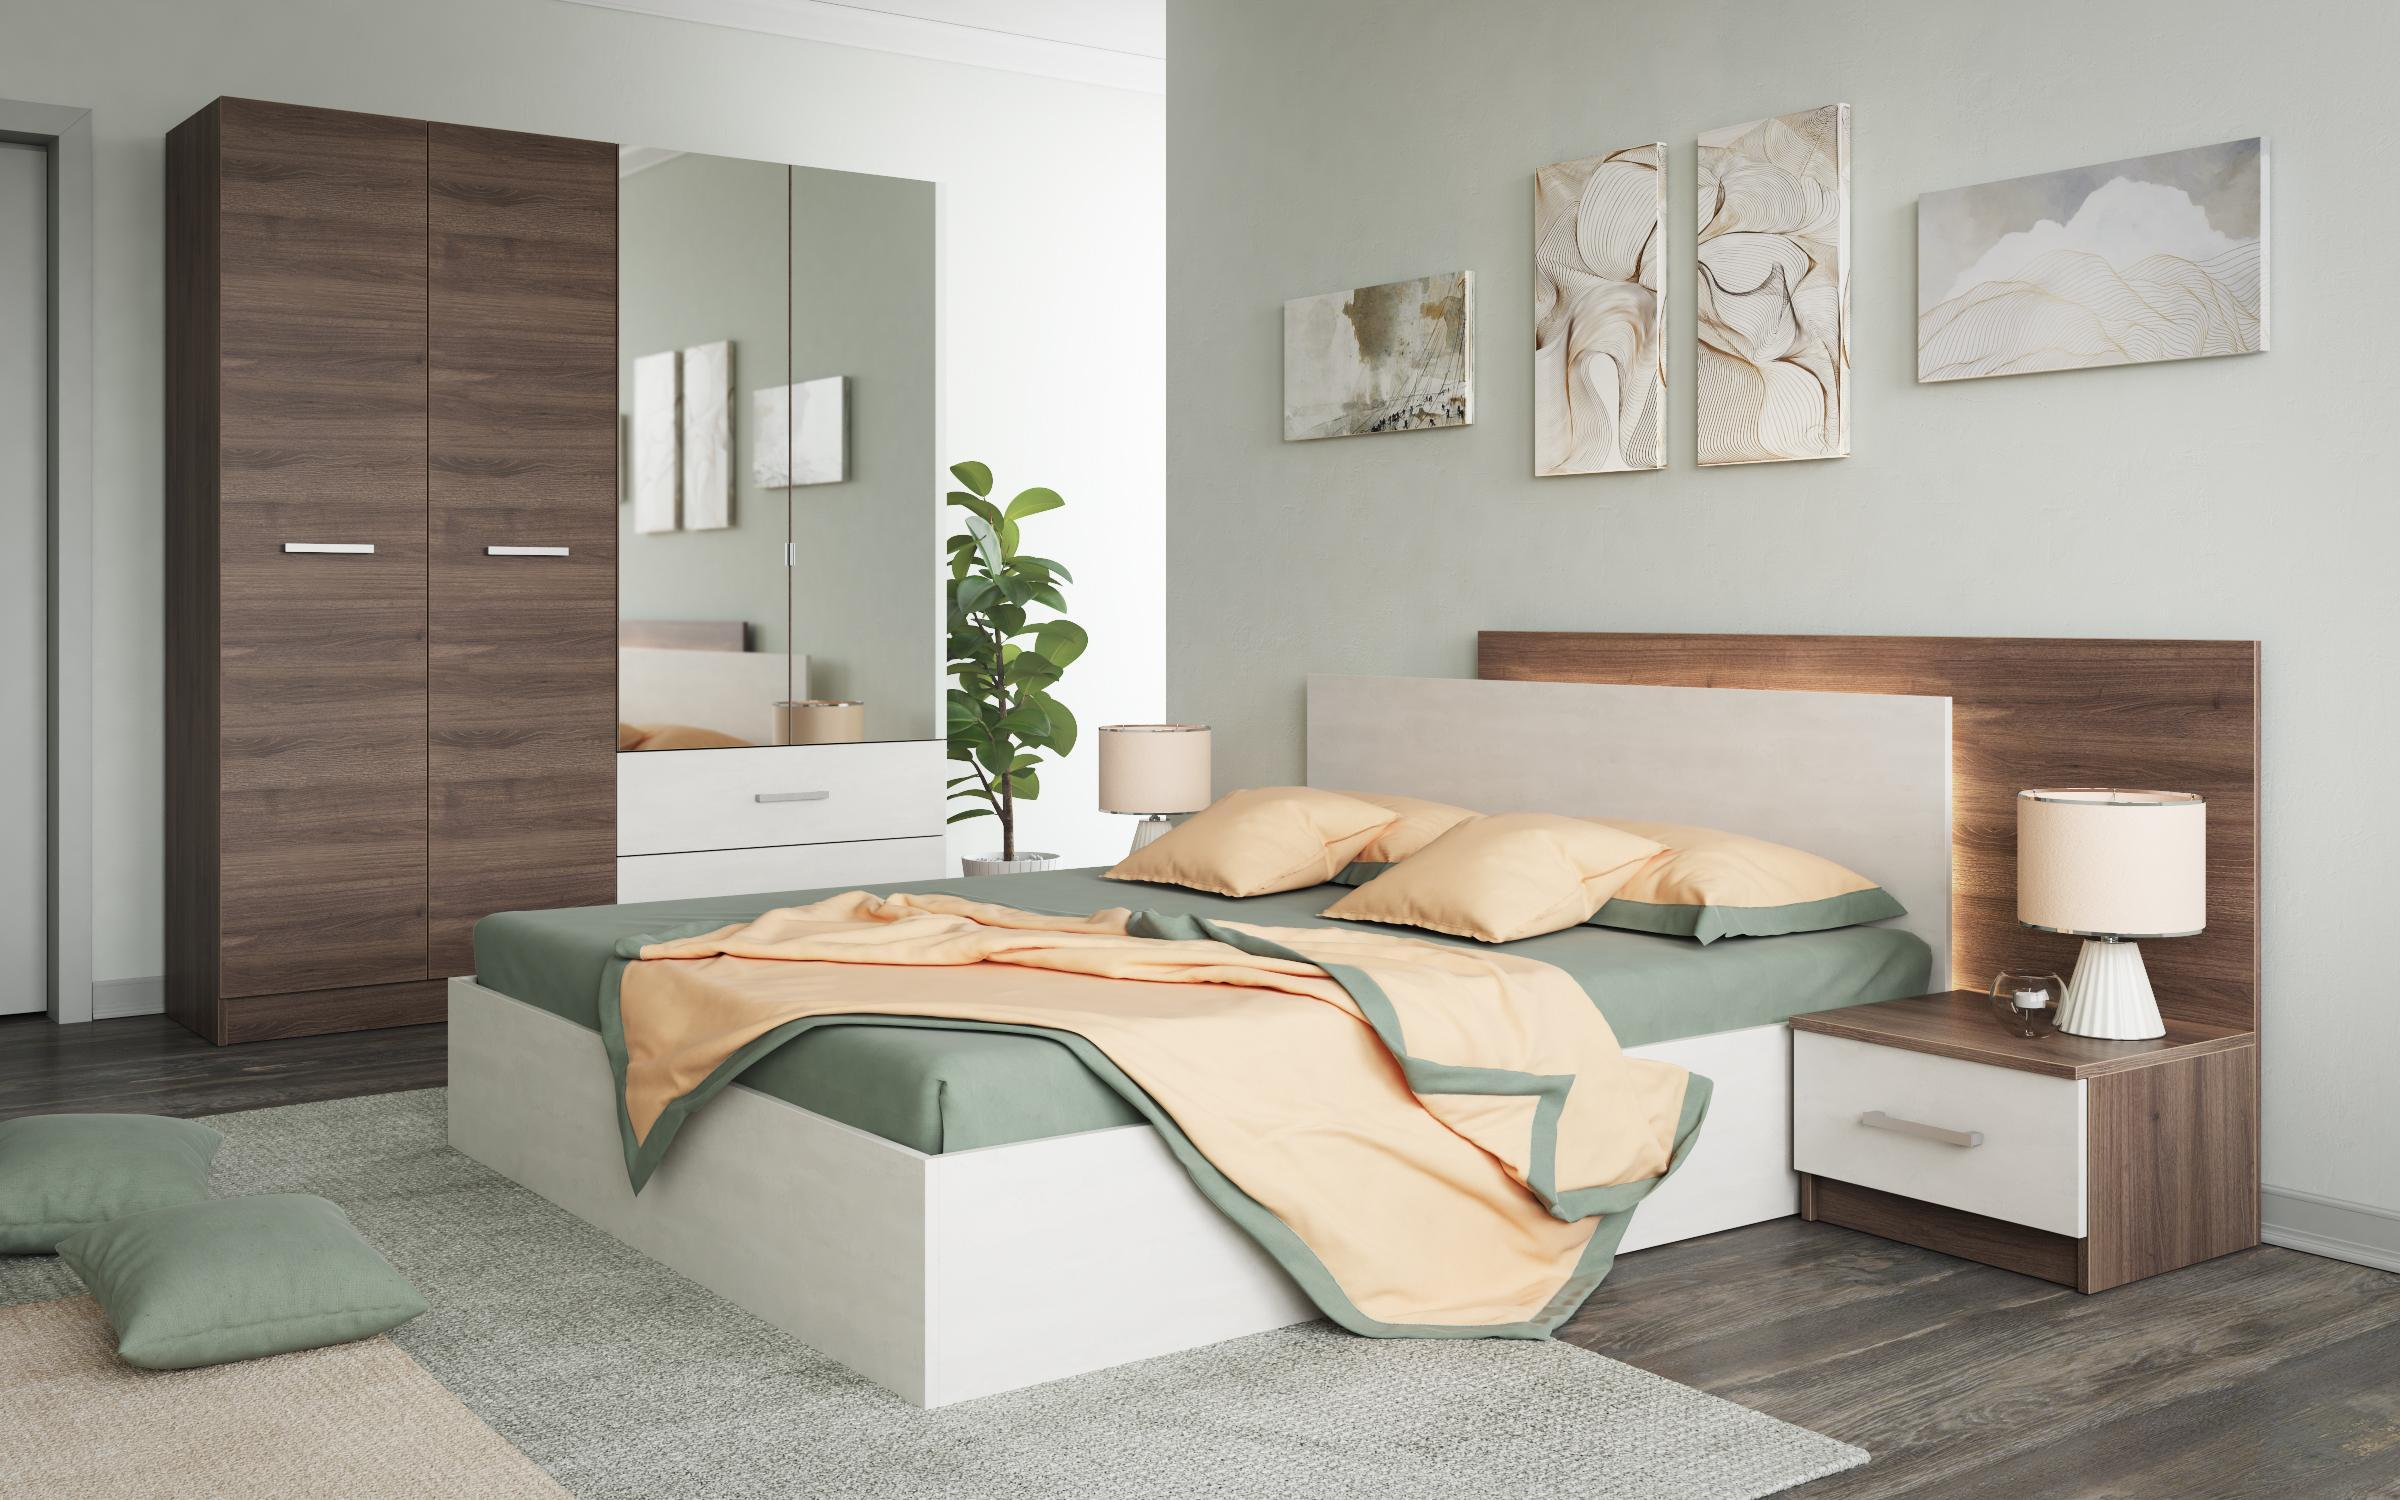 Спален комплект Моделато+ LED осветление , дъб какао + Silk